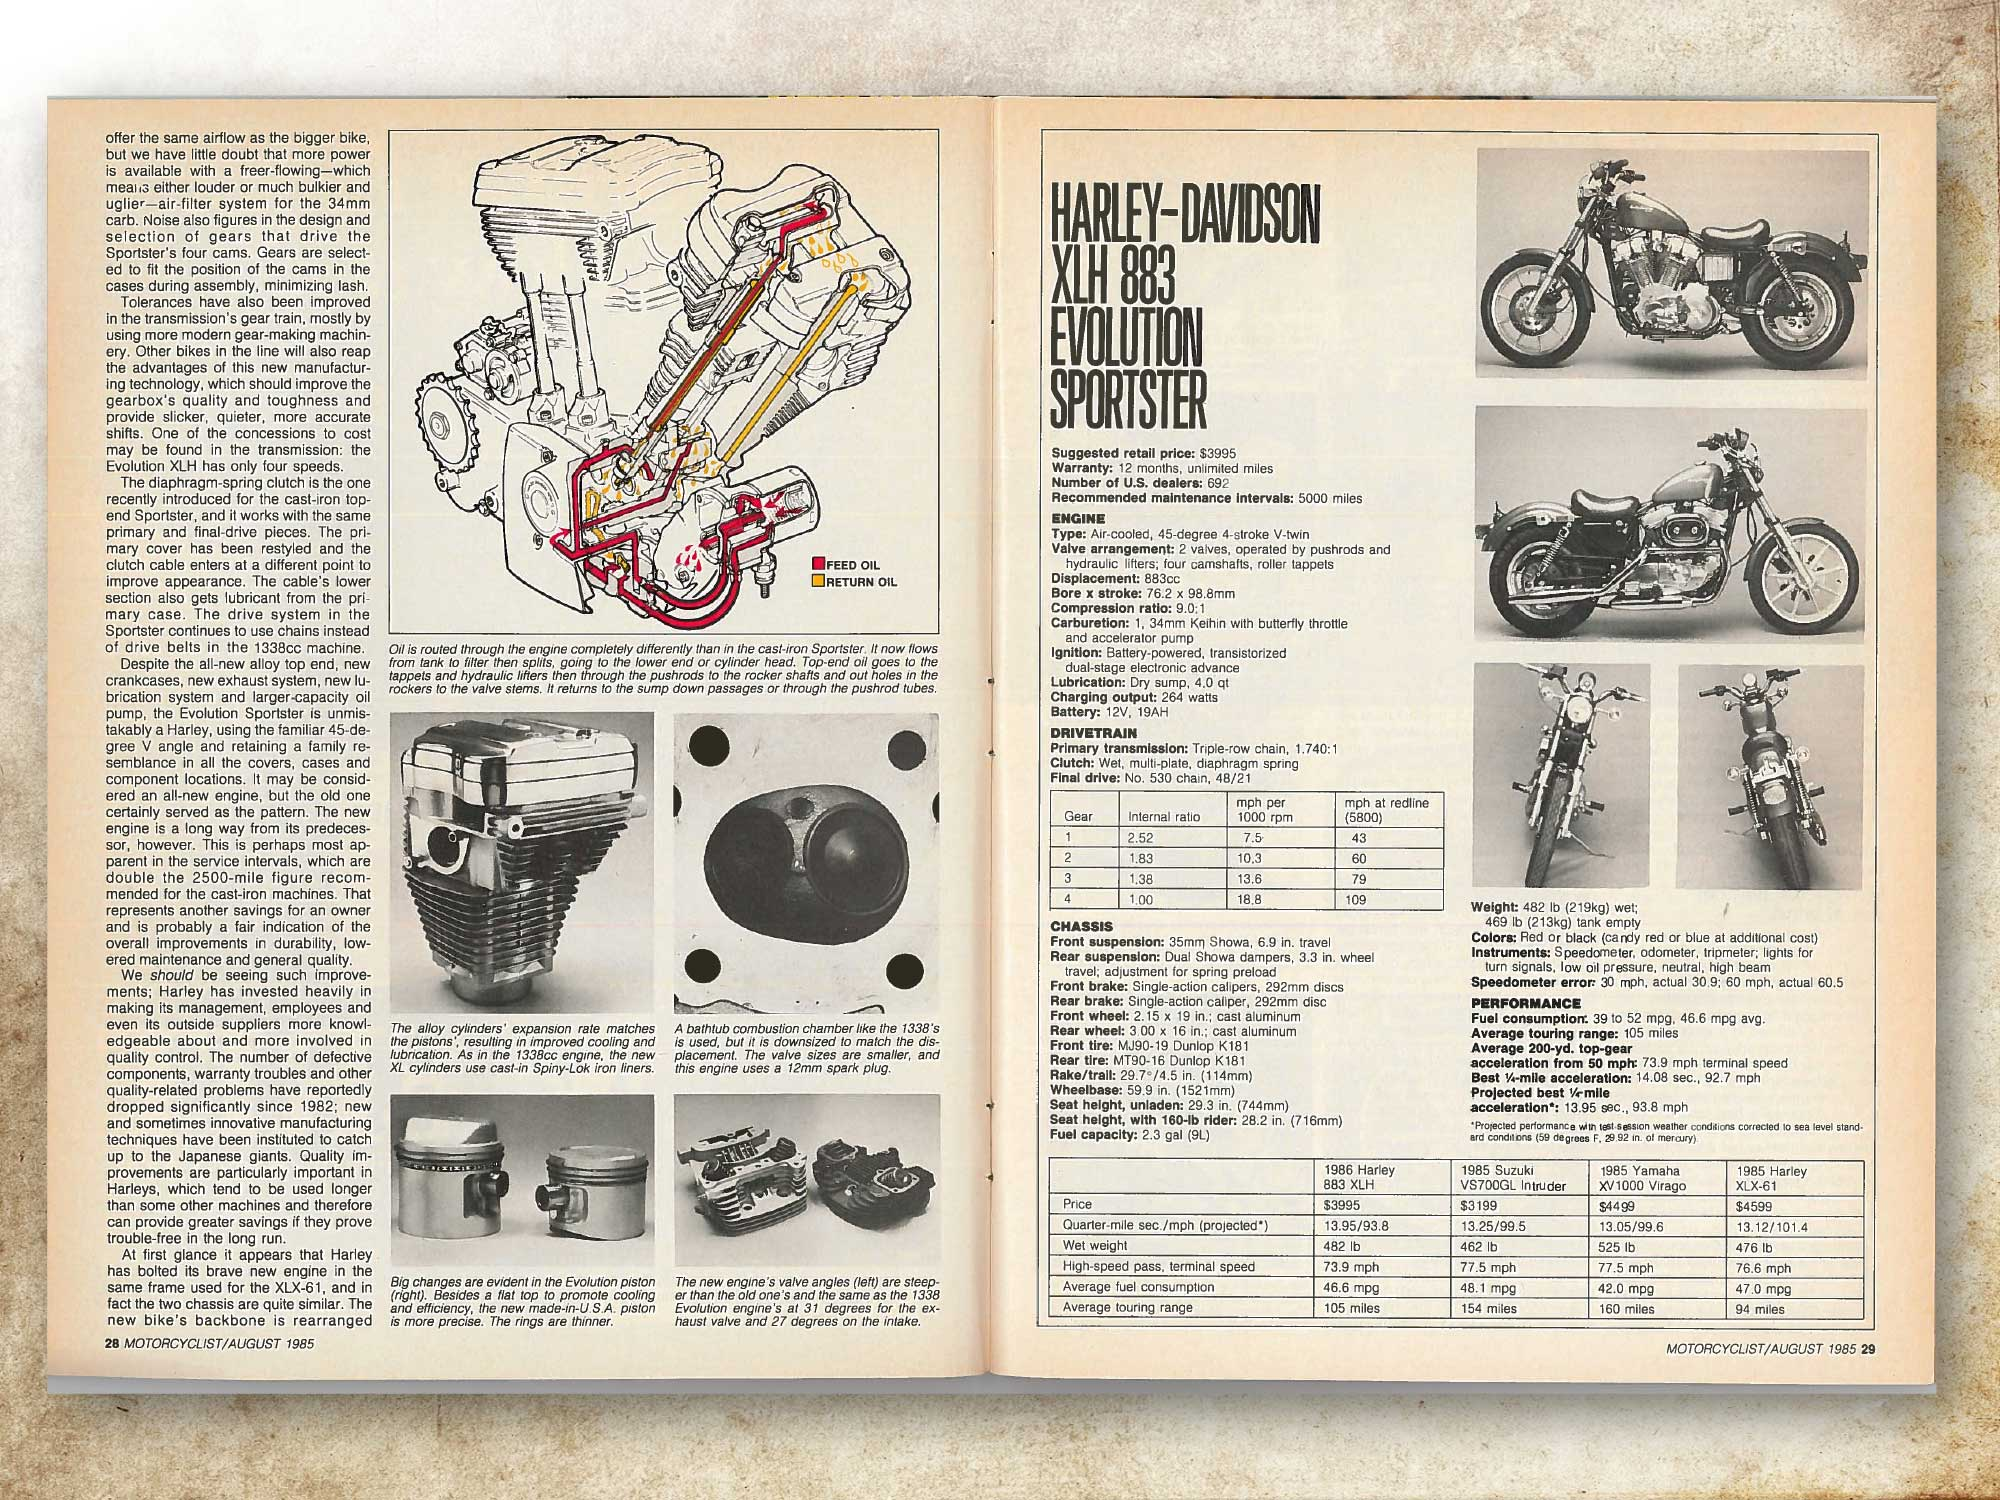 Motorcyclist Archives 1985: H-D 883 XLH Evolution Sportster